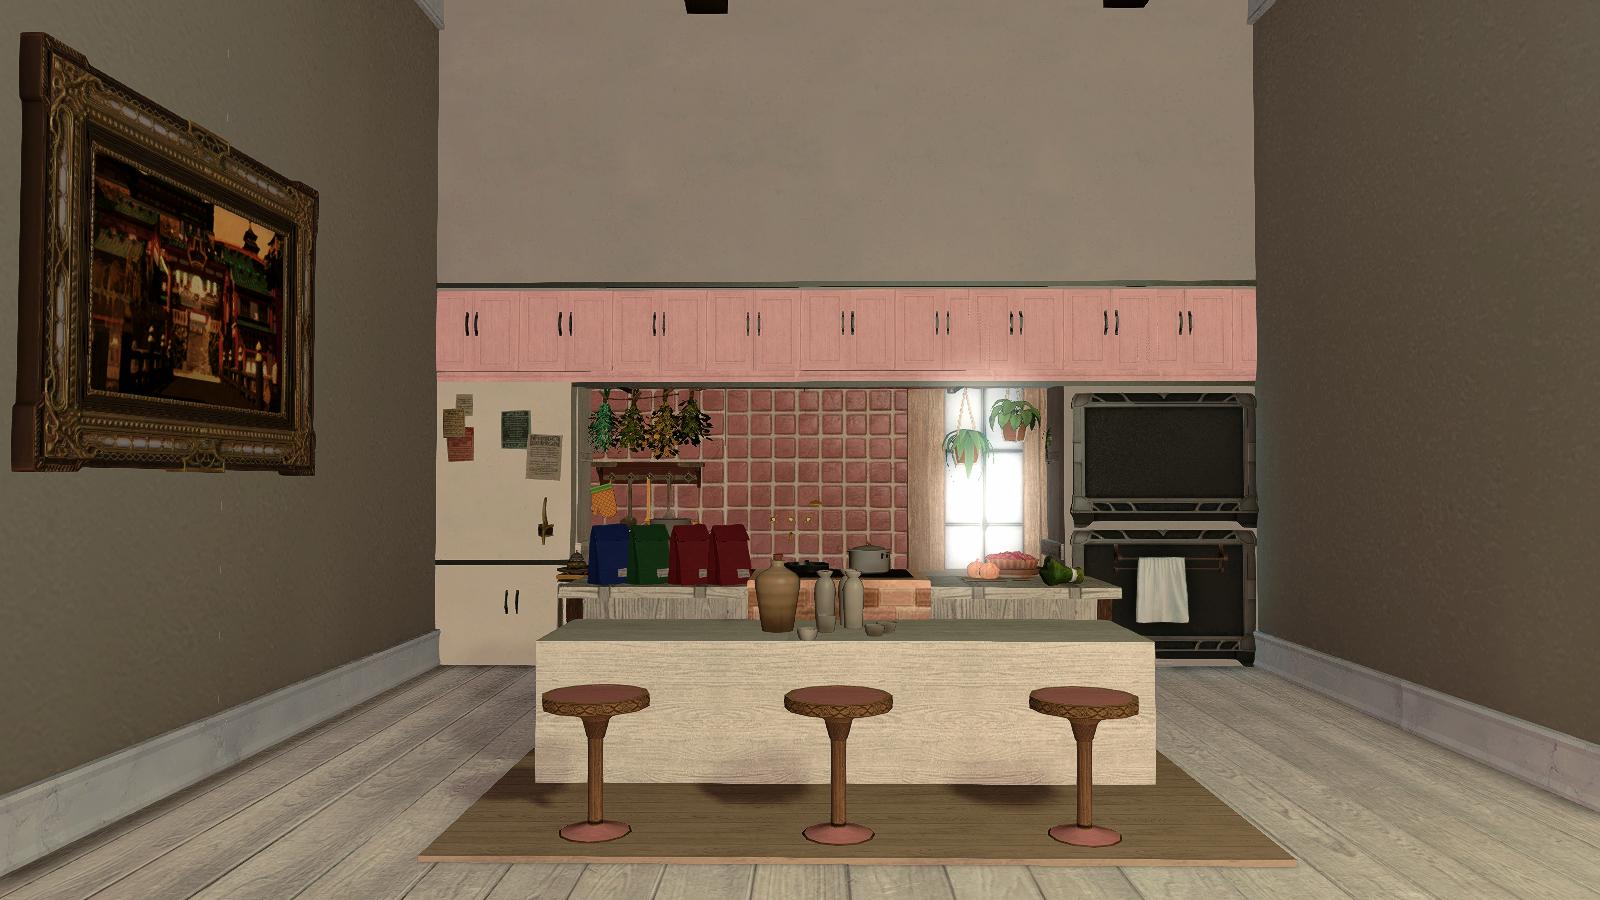 Final Fantasy Xiv Housing Showcase Hingan Kitchen Mmorpg Com